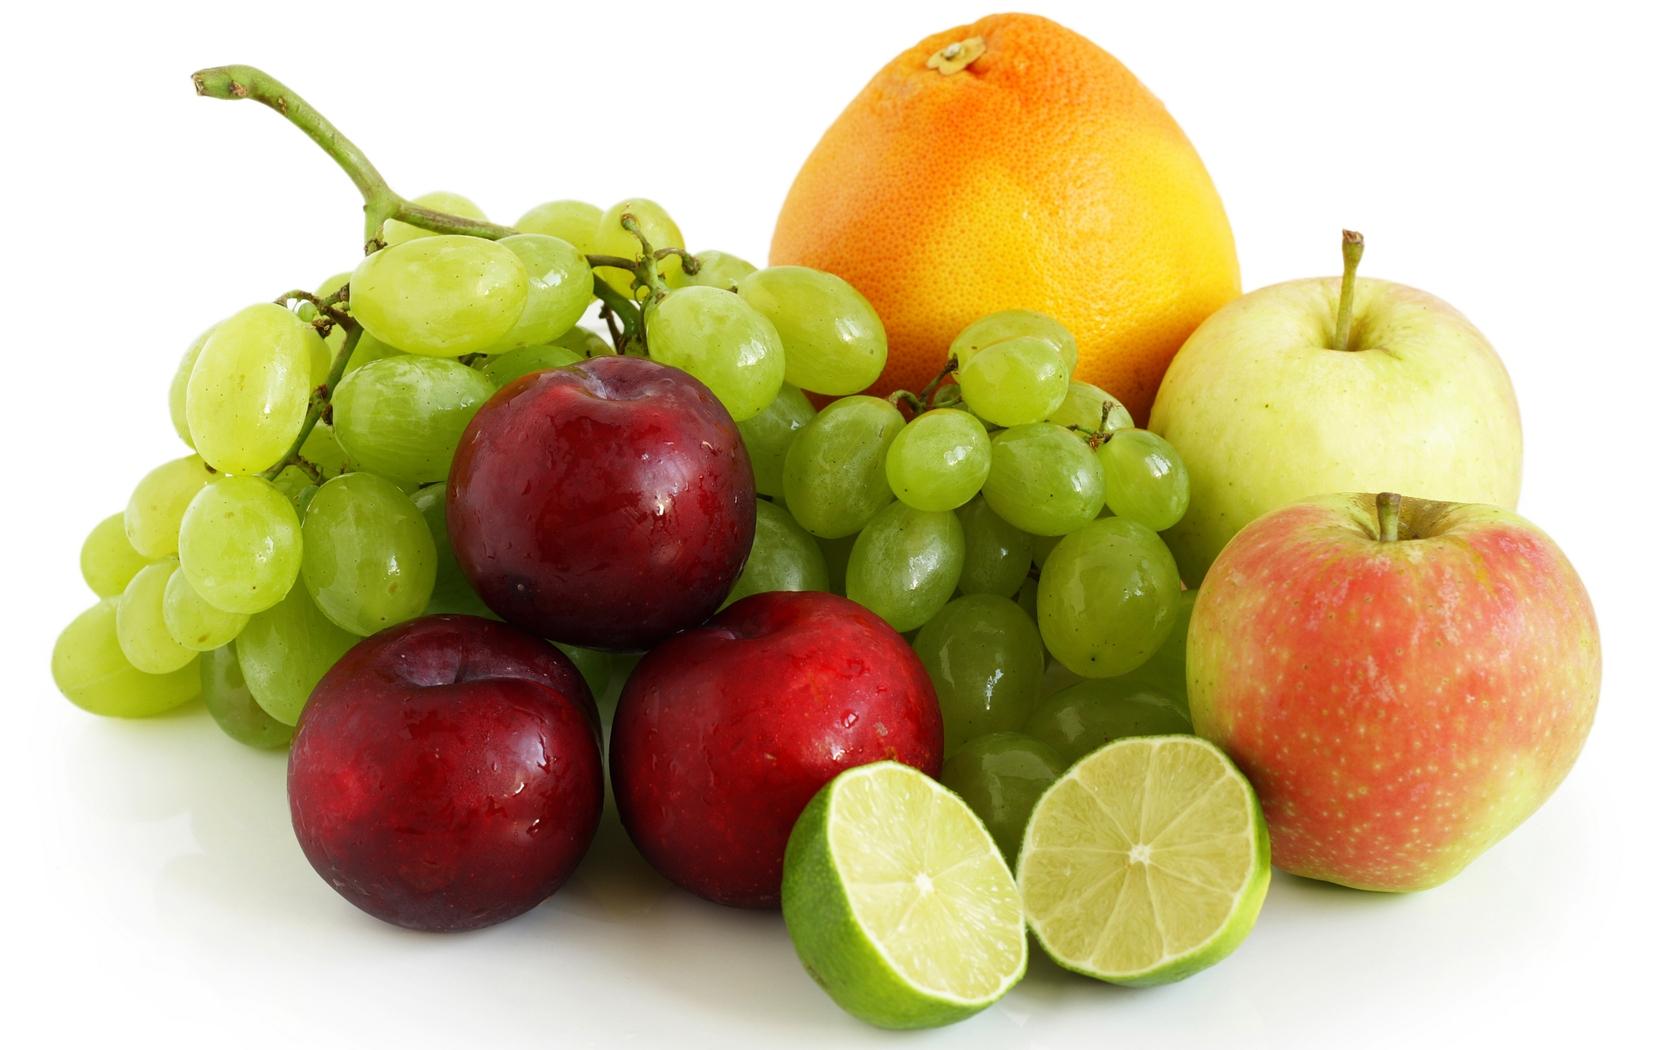 Fruits Hd Wallpapers Hd Wallpapers Fruits Desktop Backgrounds 1680x1050